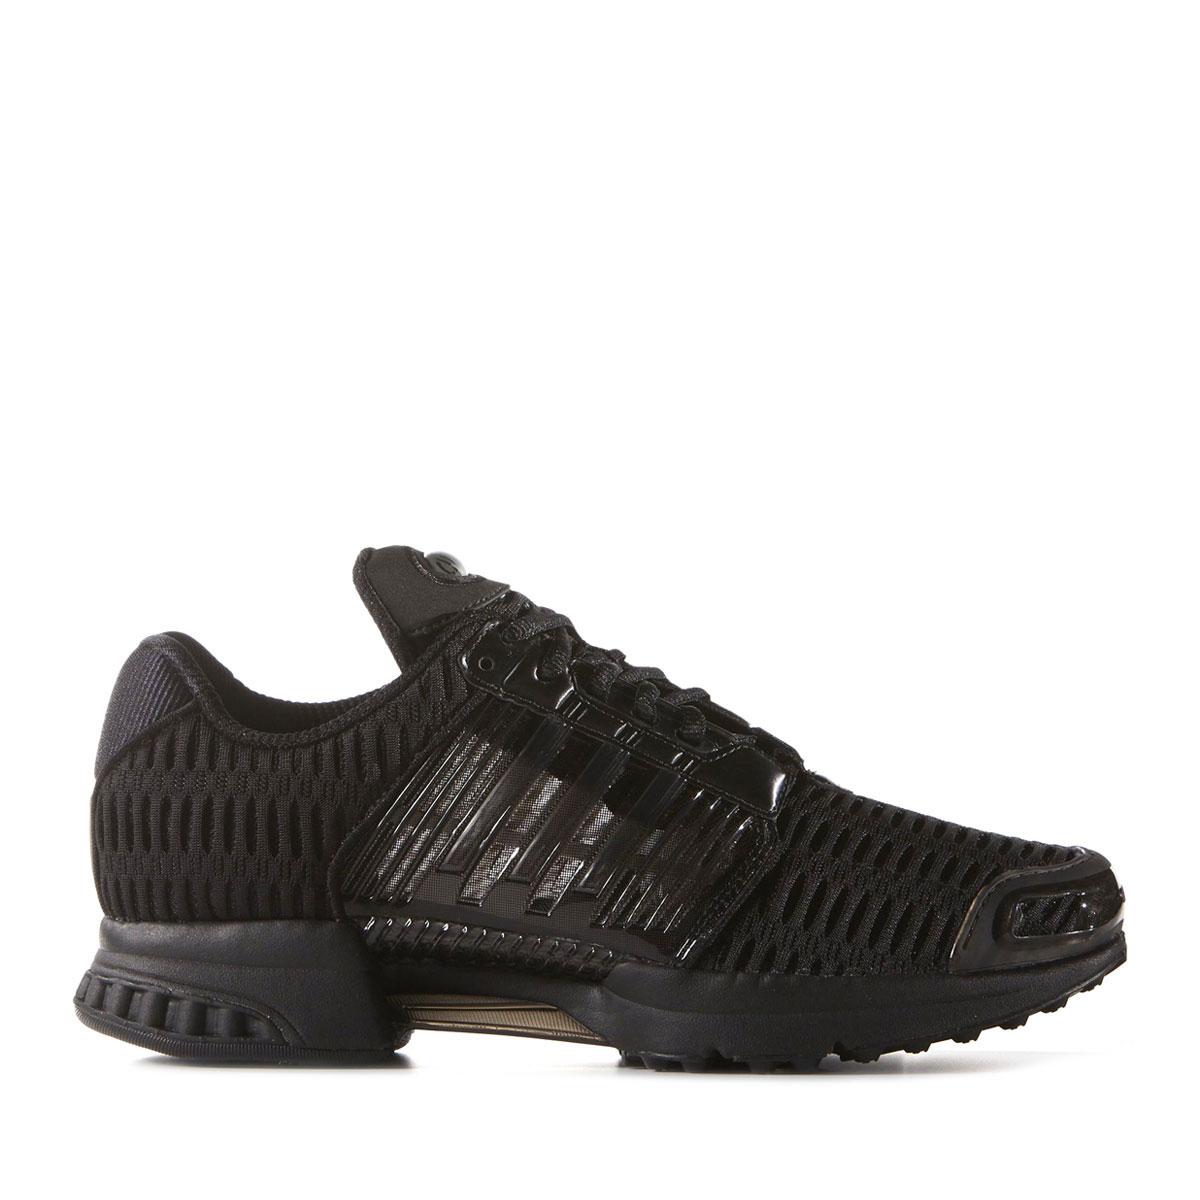 online store 9a1aa 7da6d adidas CLIMACOOL 1 (アディダスクライマクール 1) Core BlackCore BlackCore Black 17FW-I